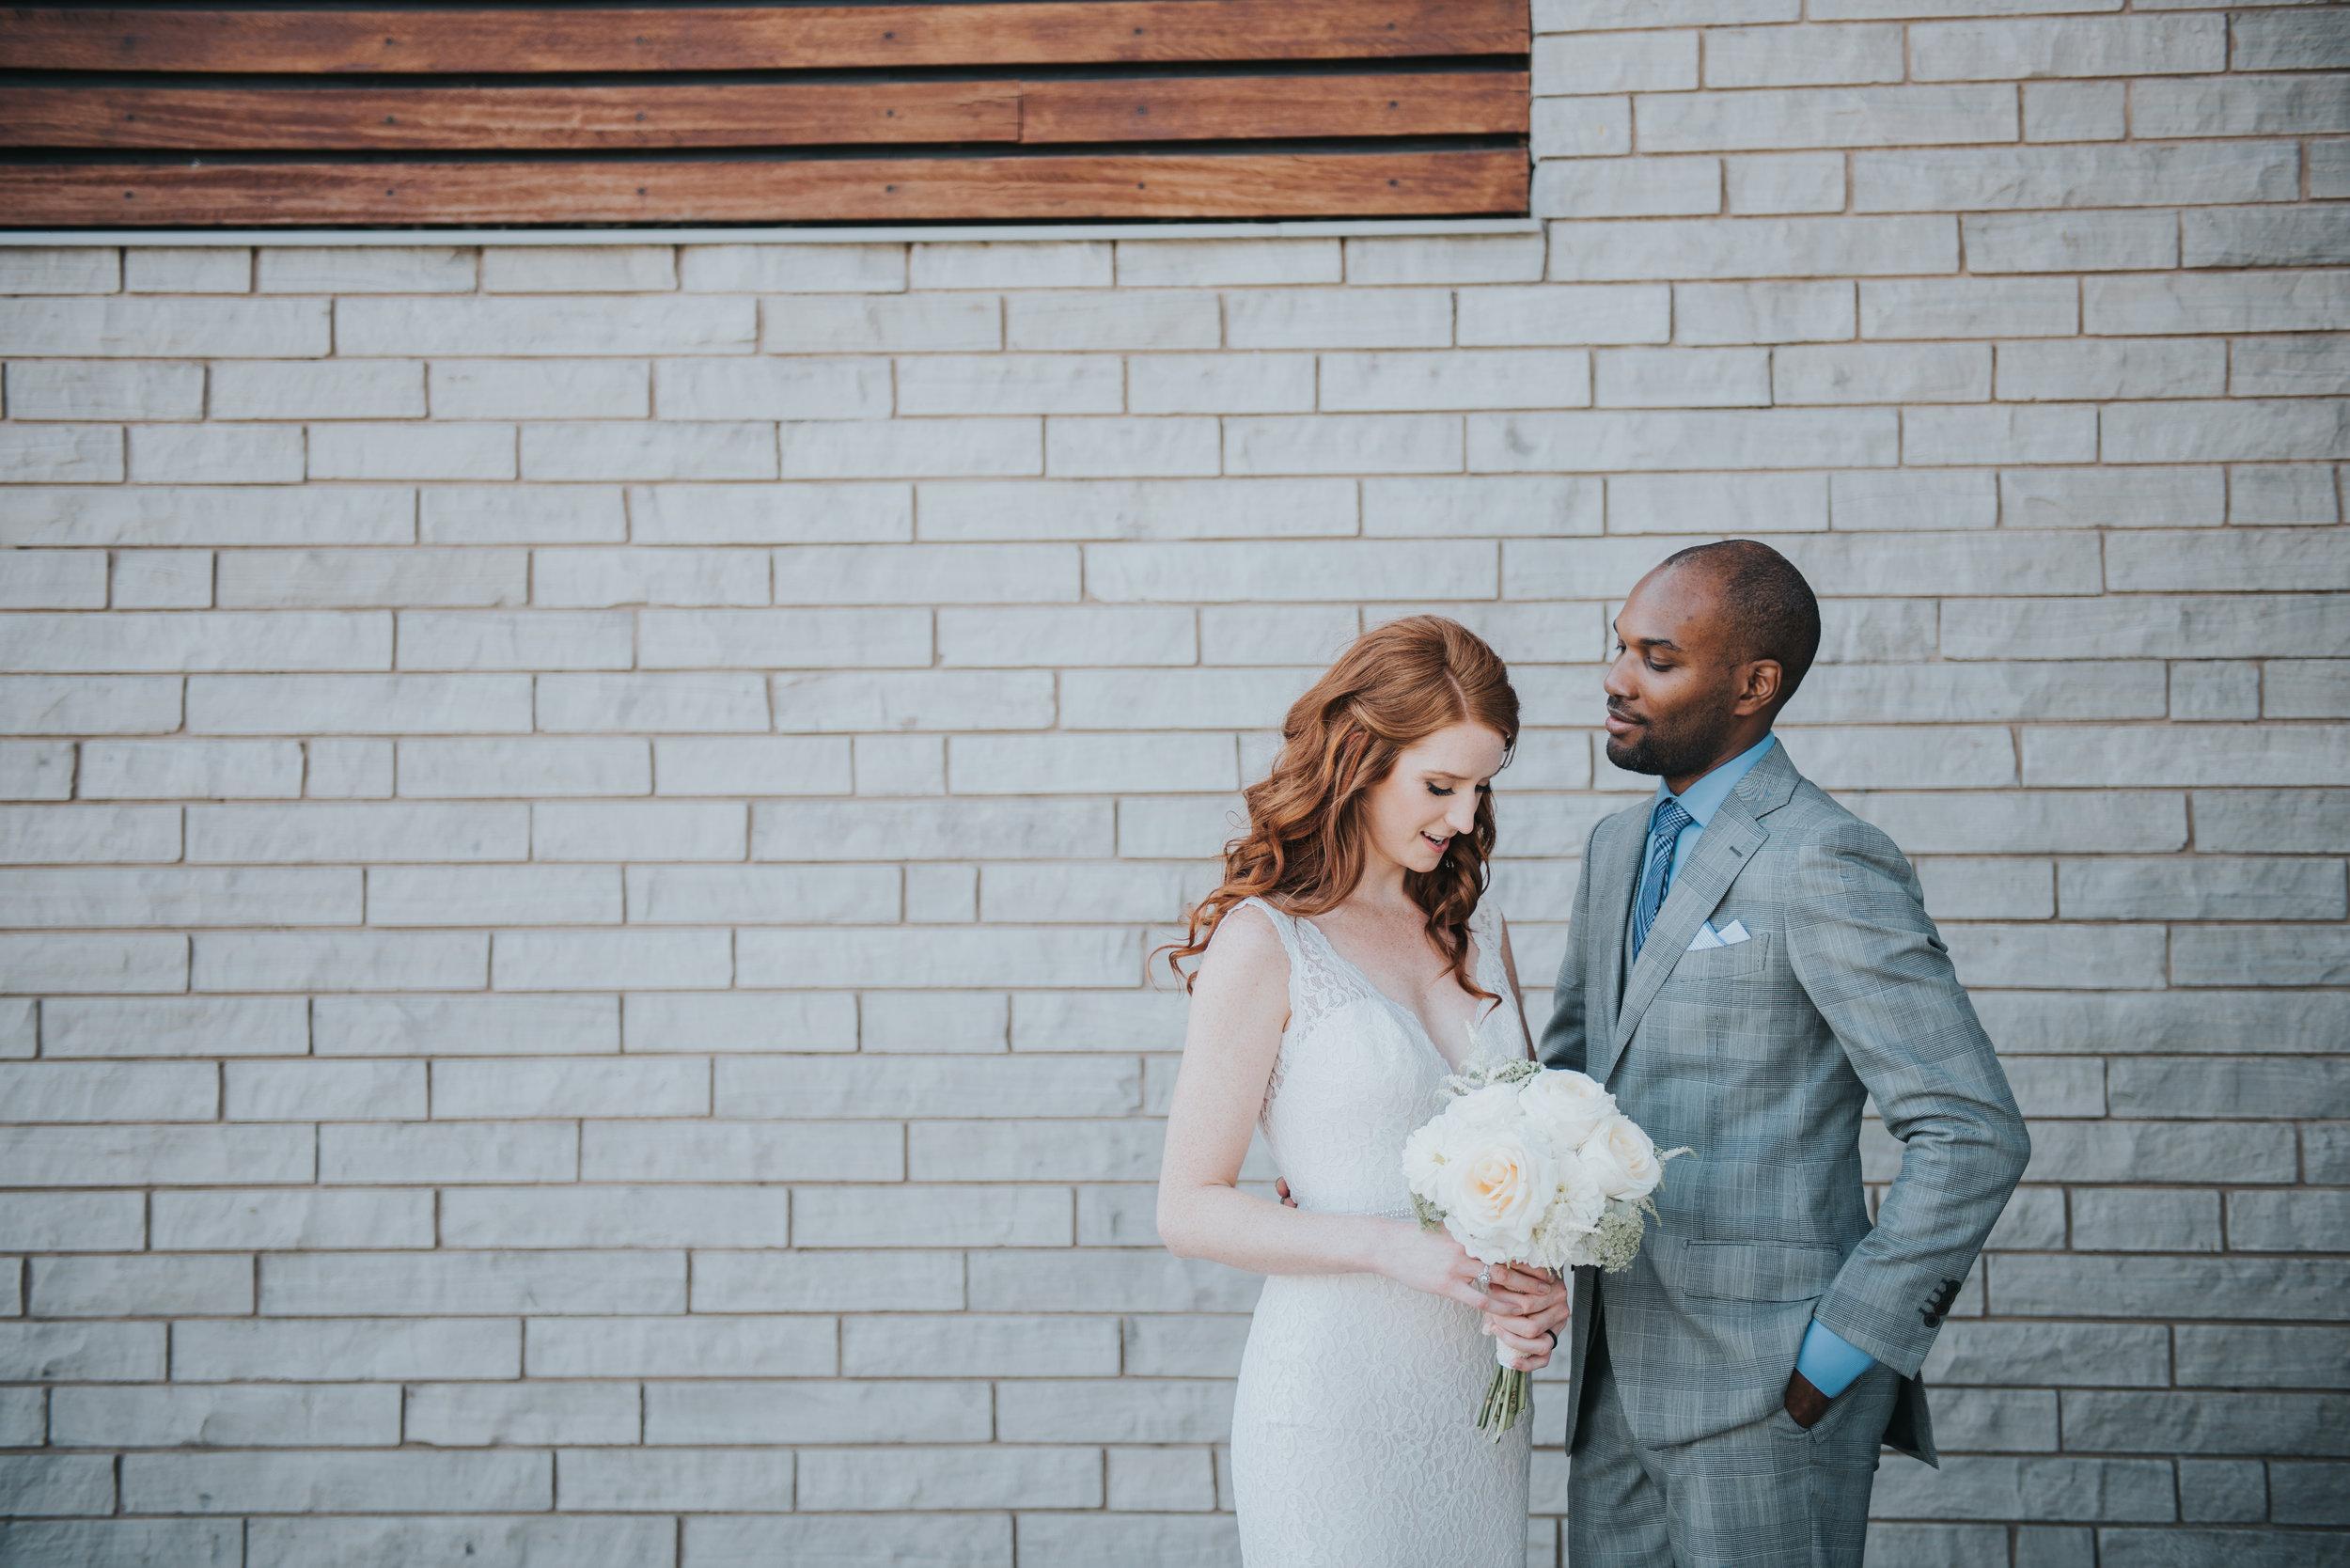 bride-groom-portrait-toronto-outdoor-summer-wedding-documentary-wedding-photography-by-willow-birch-photo.jpg